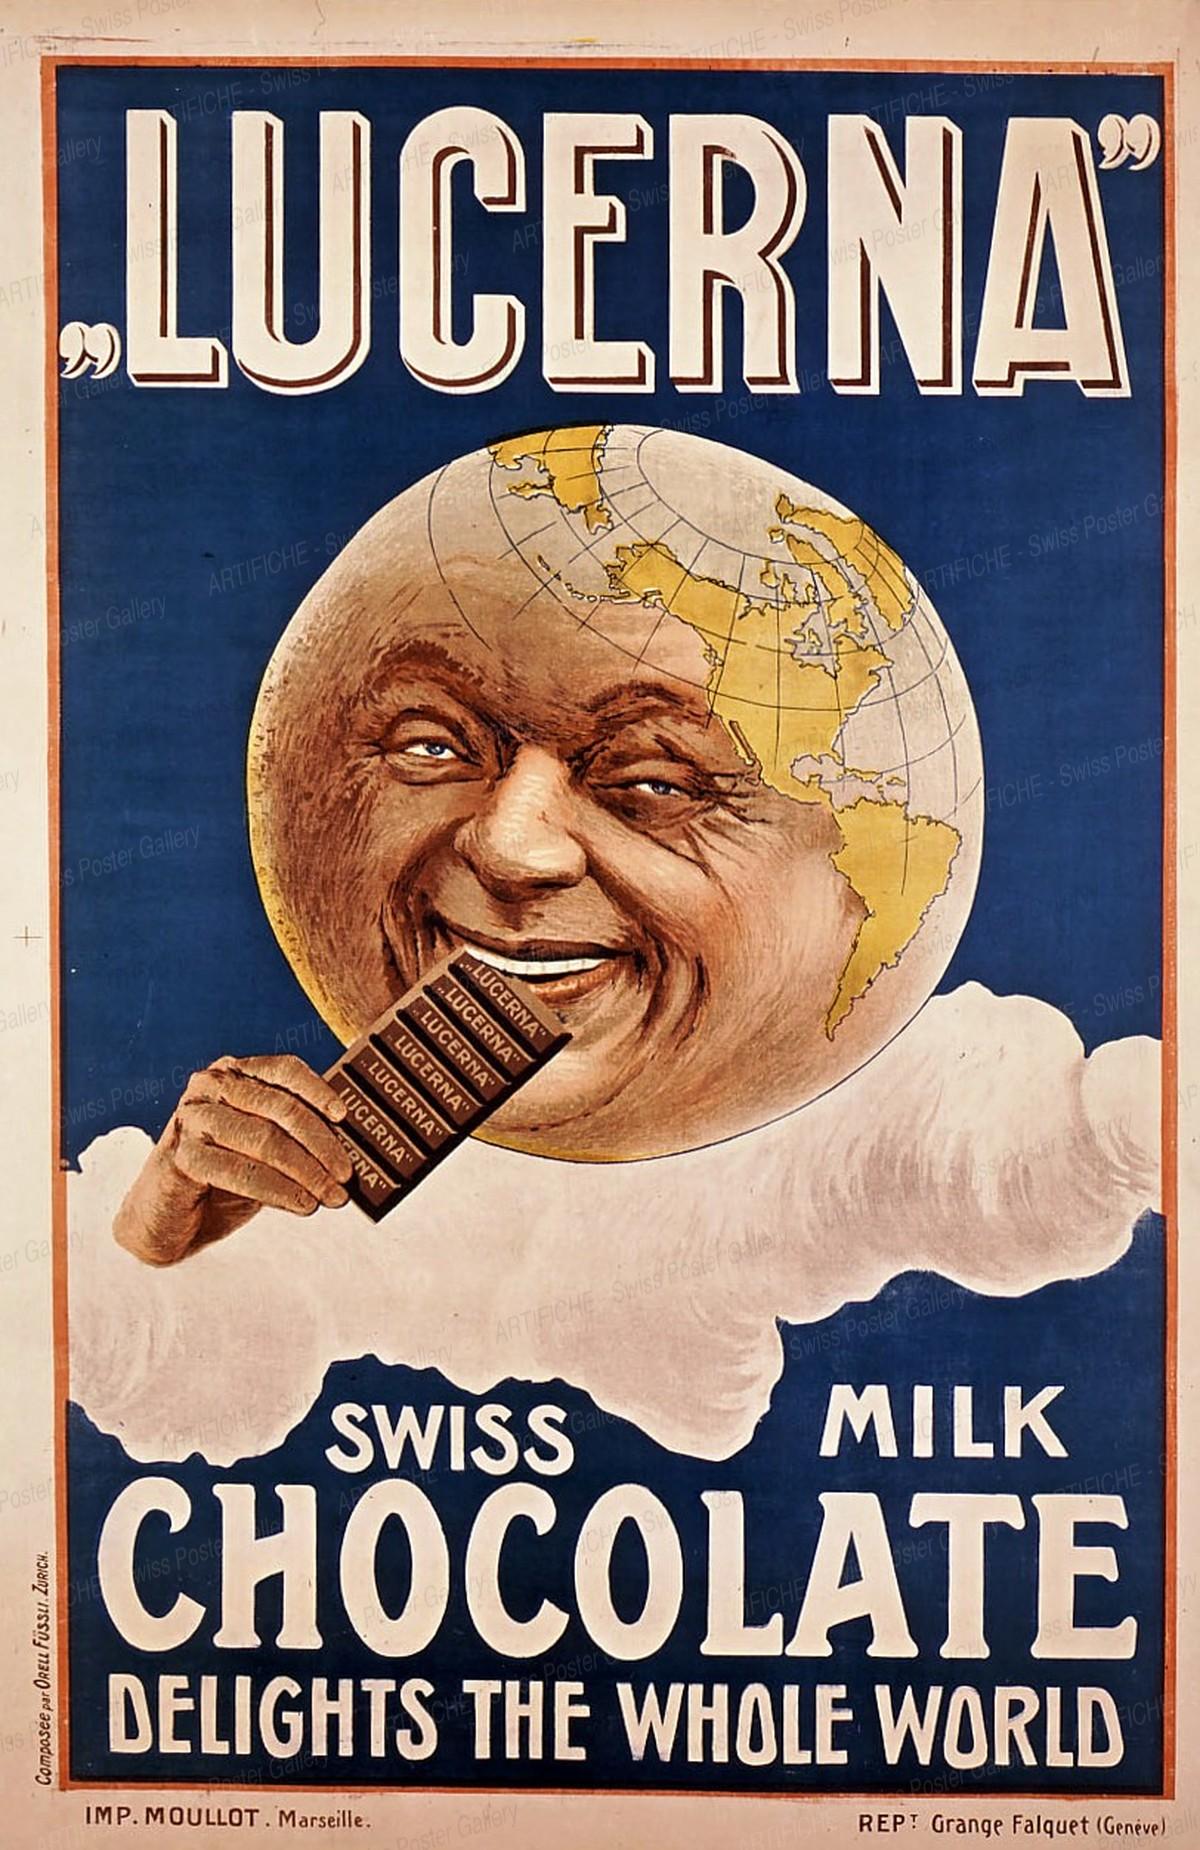 Lucerna – Swiss Milk Chocolate Delights the Whole World, Grange-Falquet